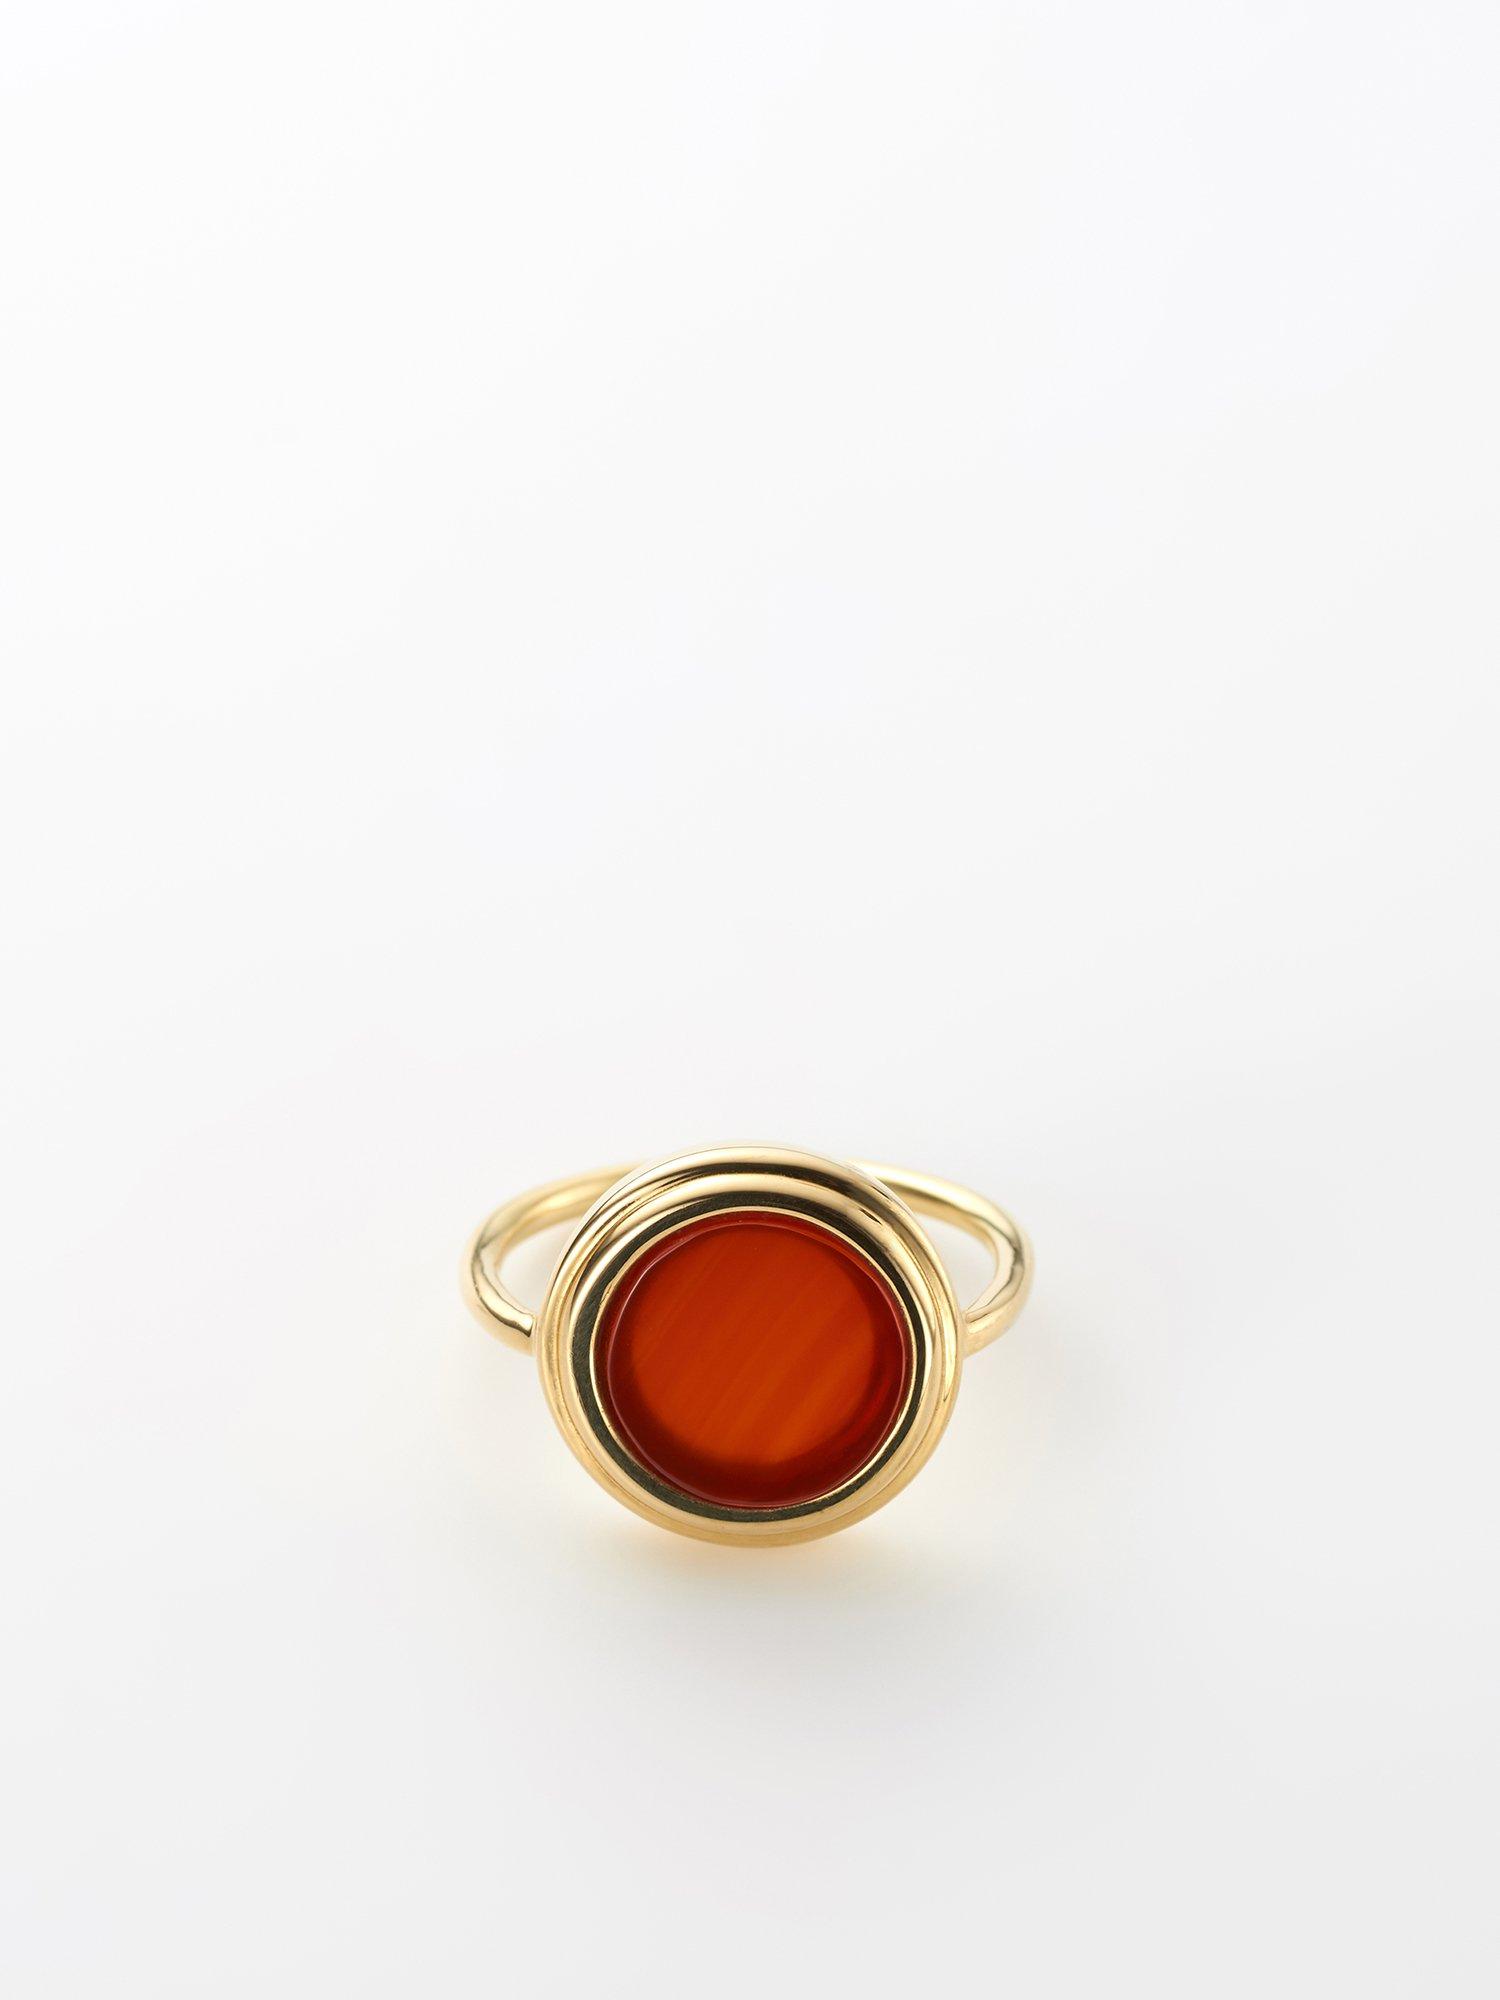 SOPHISTICATED VINTAGE / Planet ring / Carnelian / 9号 /  在庫商品